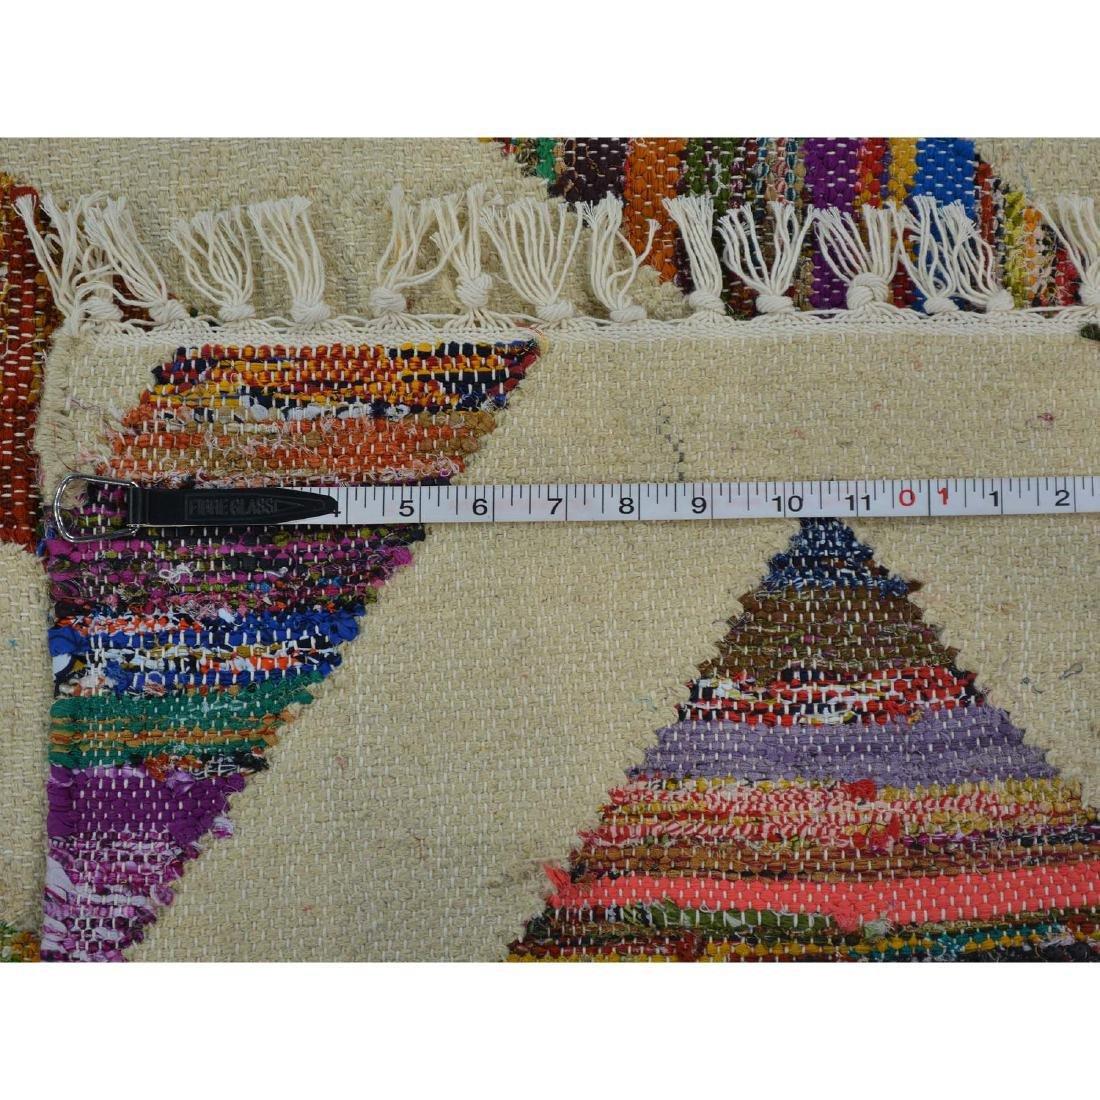 Weave Hand Woven Wool Sari Silk Durie Kilim Rug 9x11.10 - 5